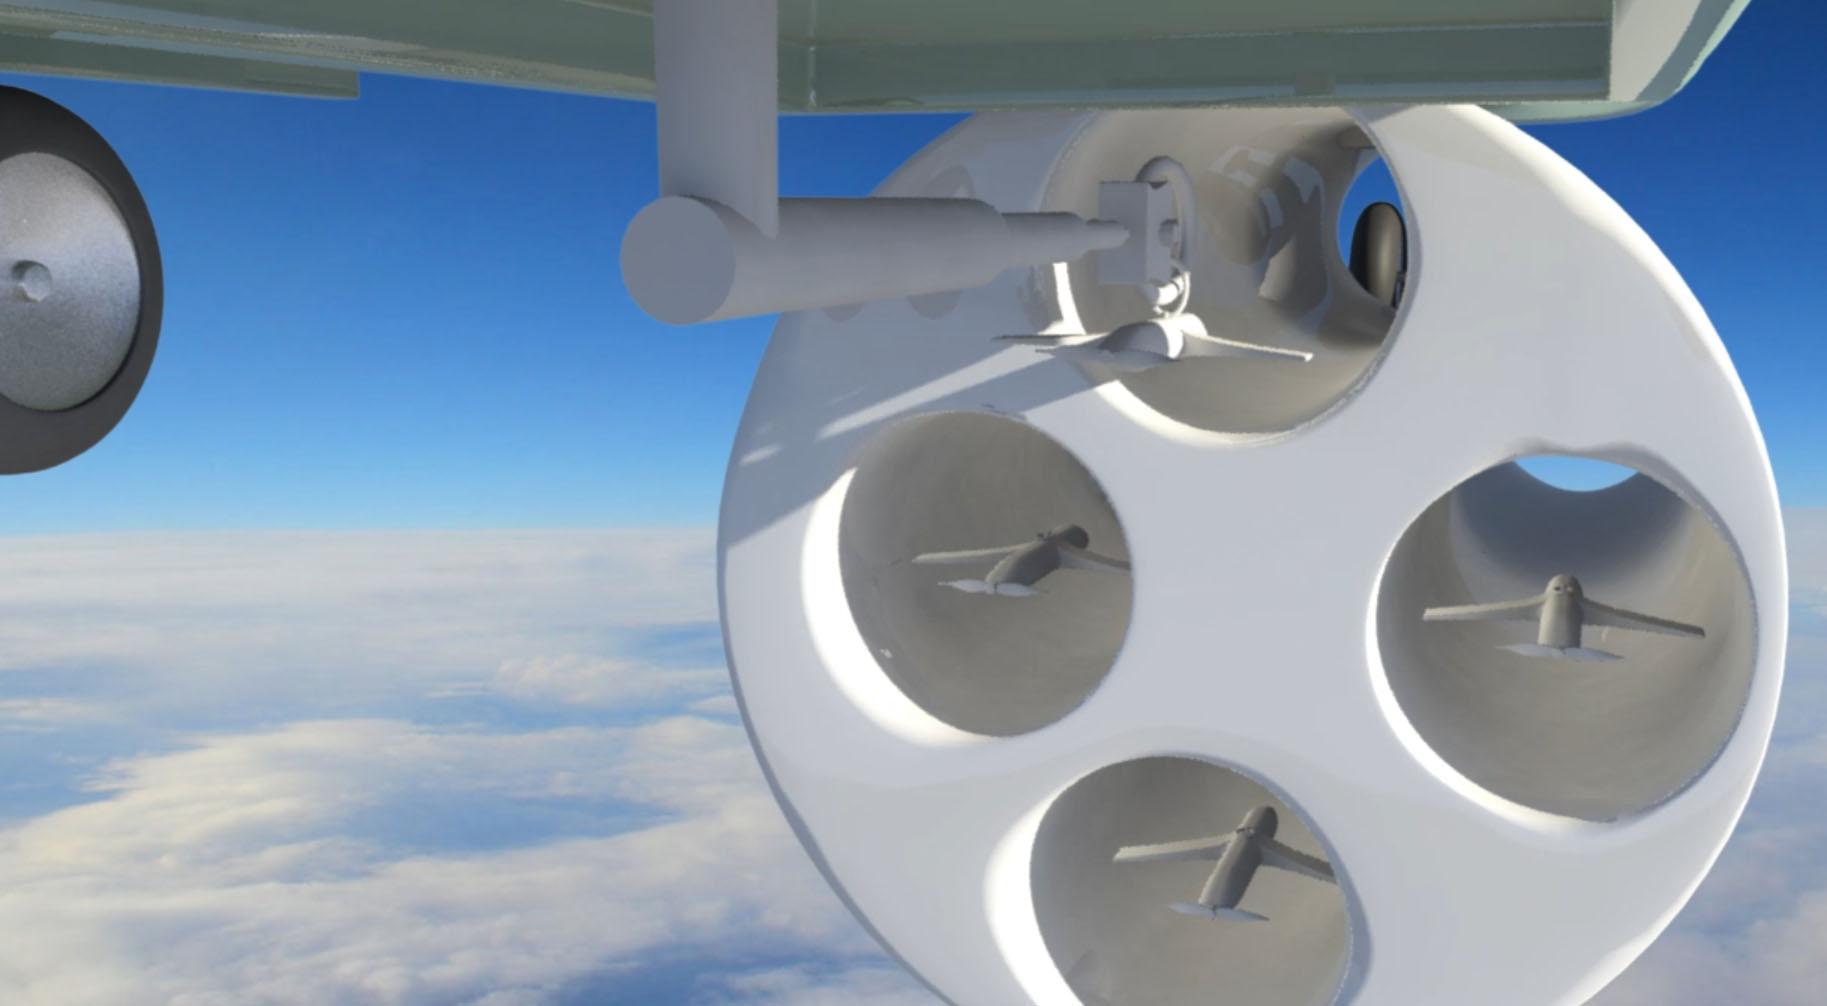 PatentYogi_Boeing Drone Magazine